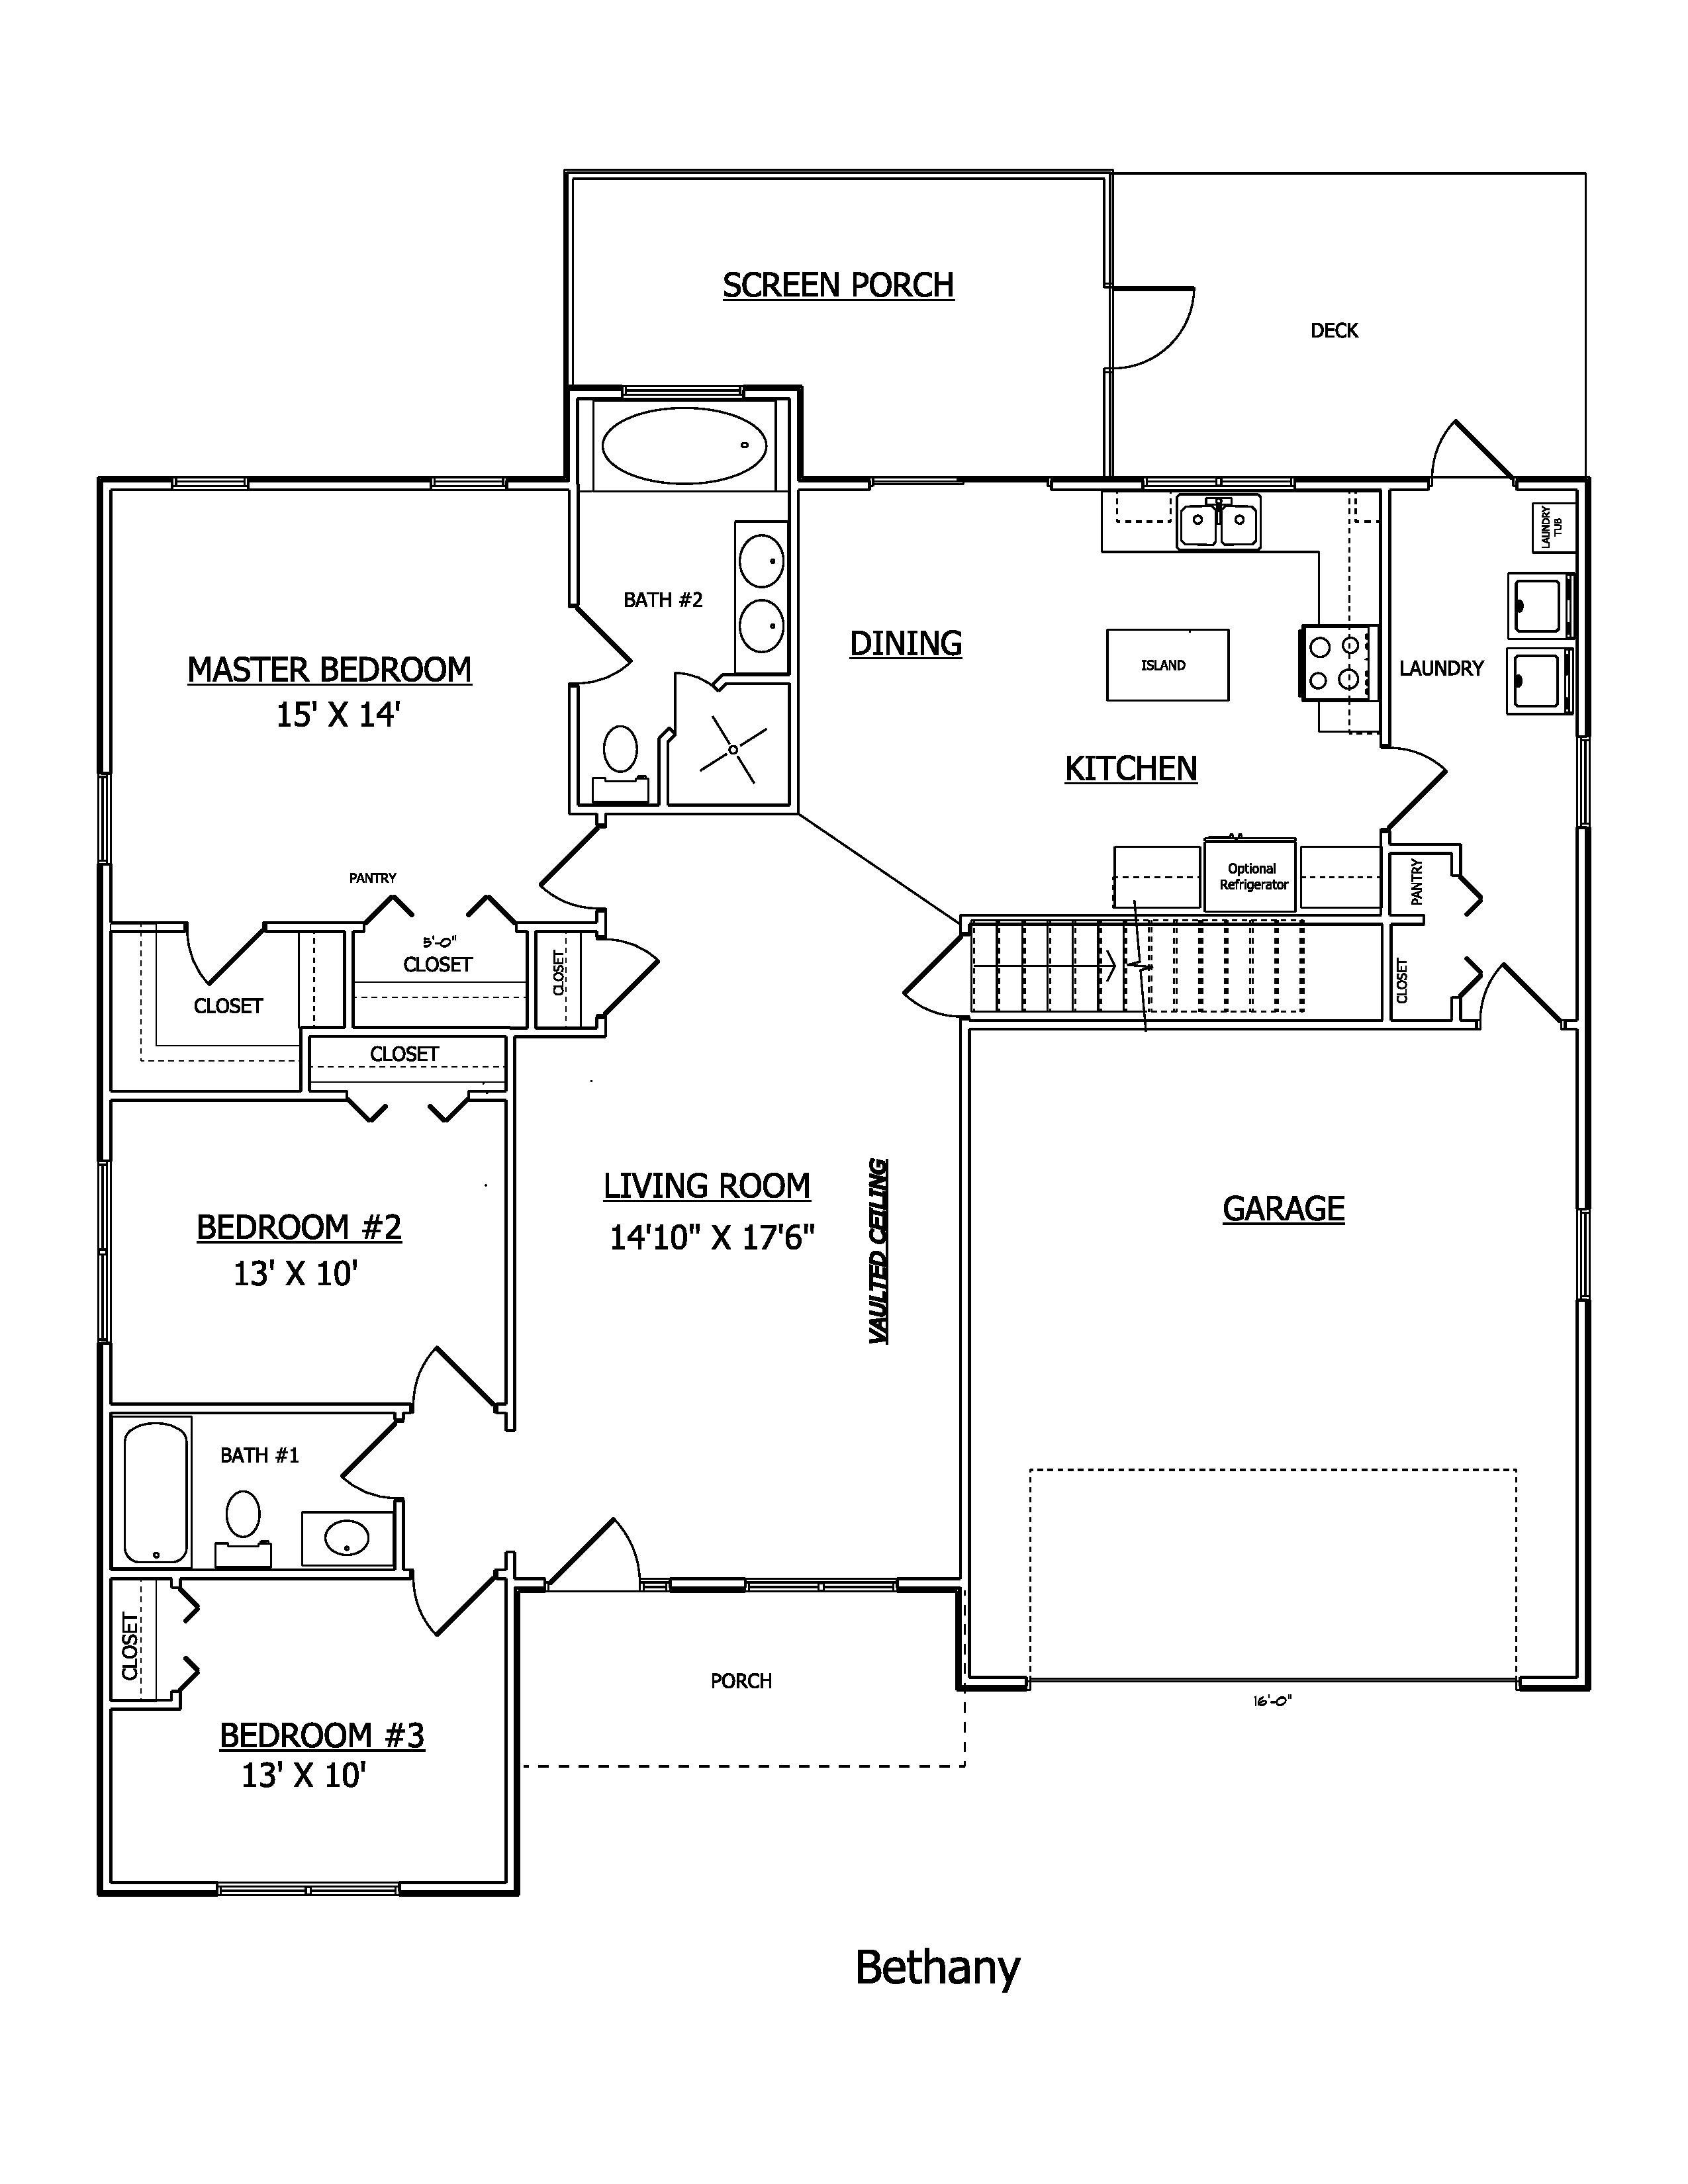 Floor plan the bethany bowers landing lenape builders for Share builders plan